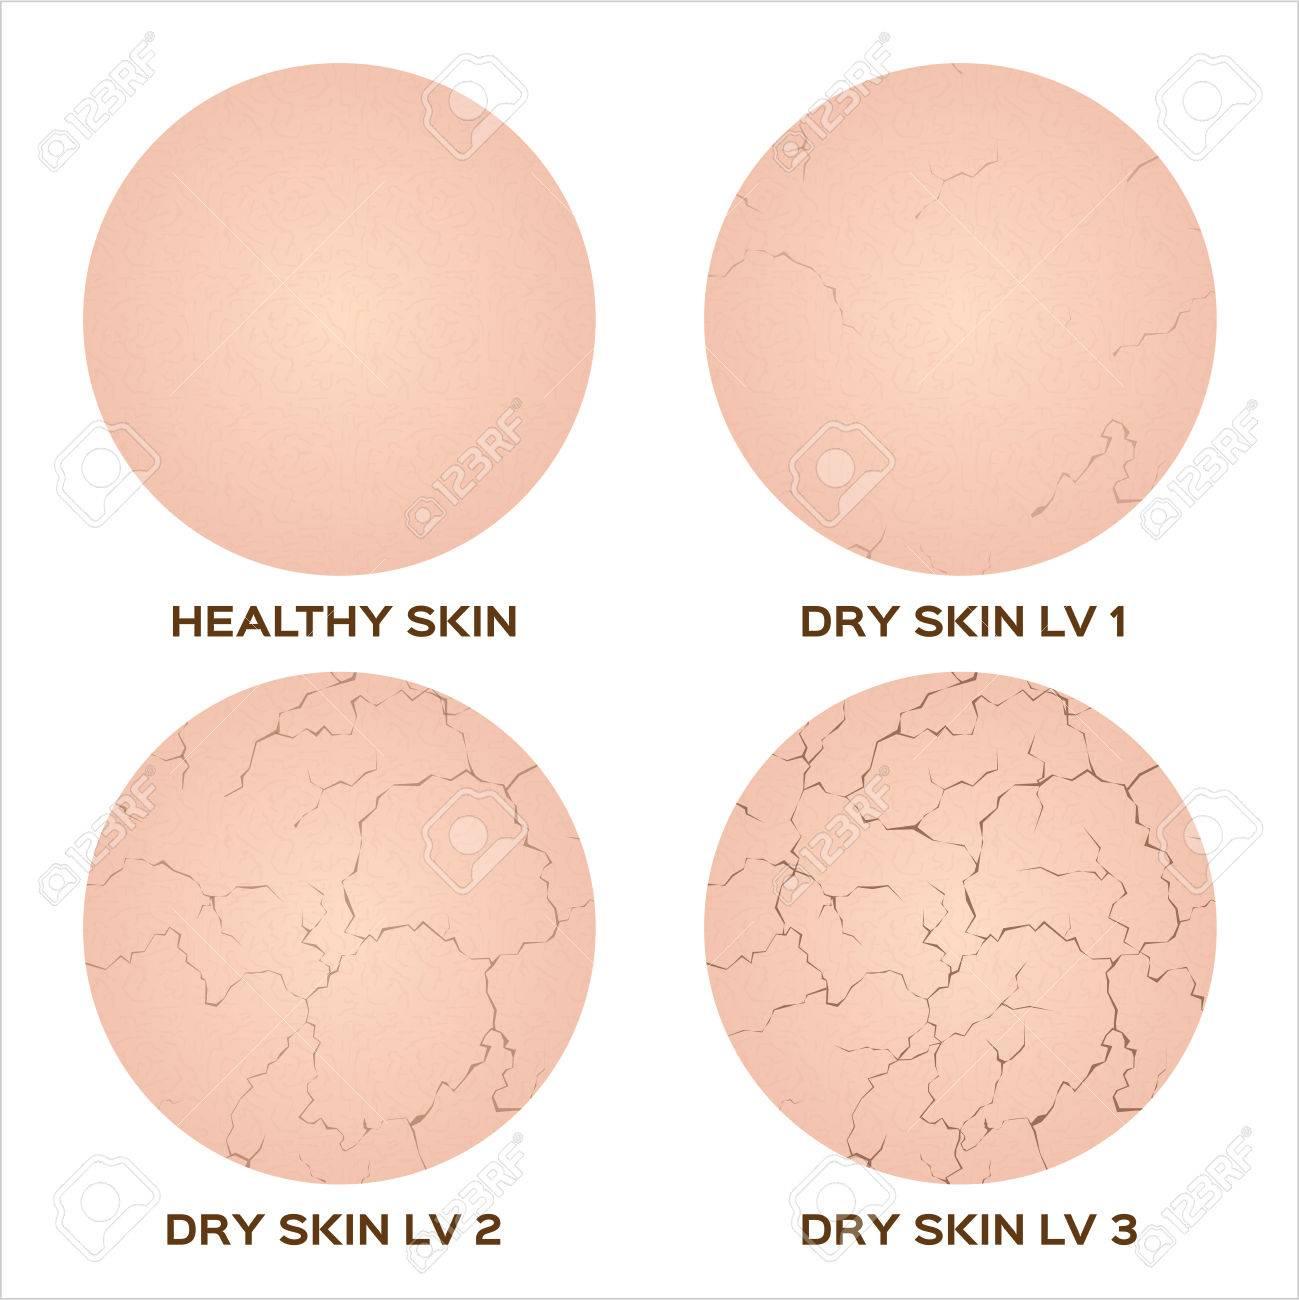 dry, drier, driest skin